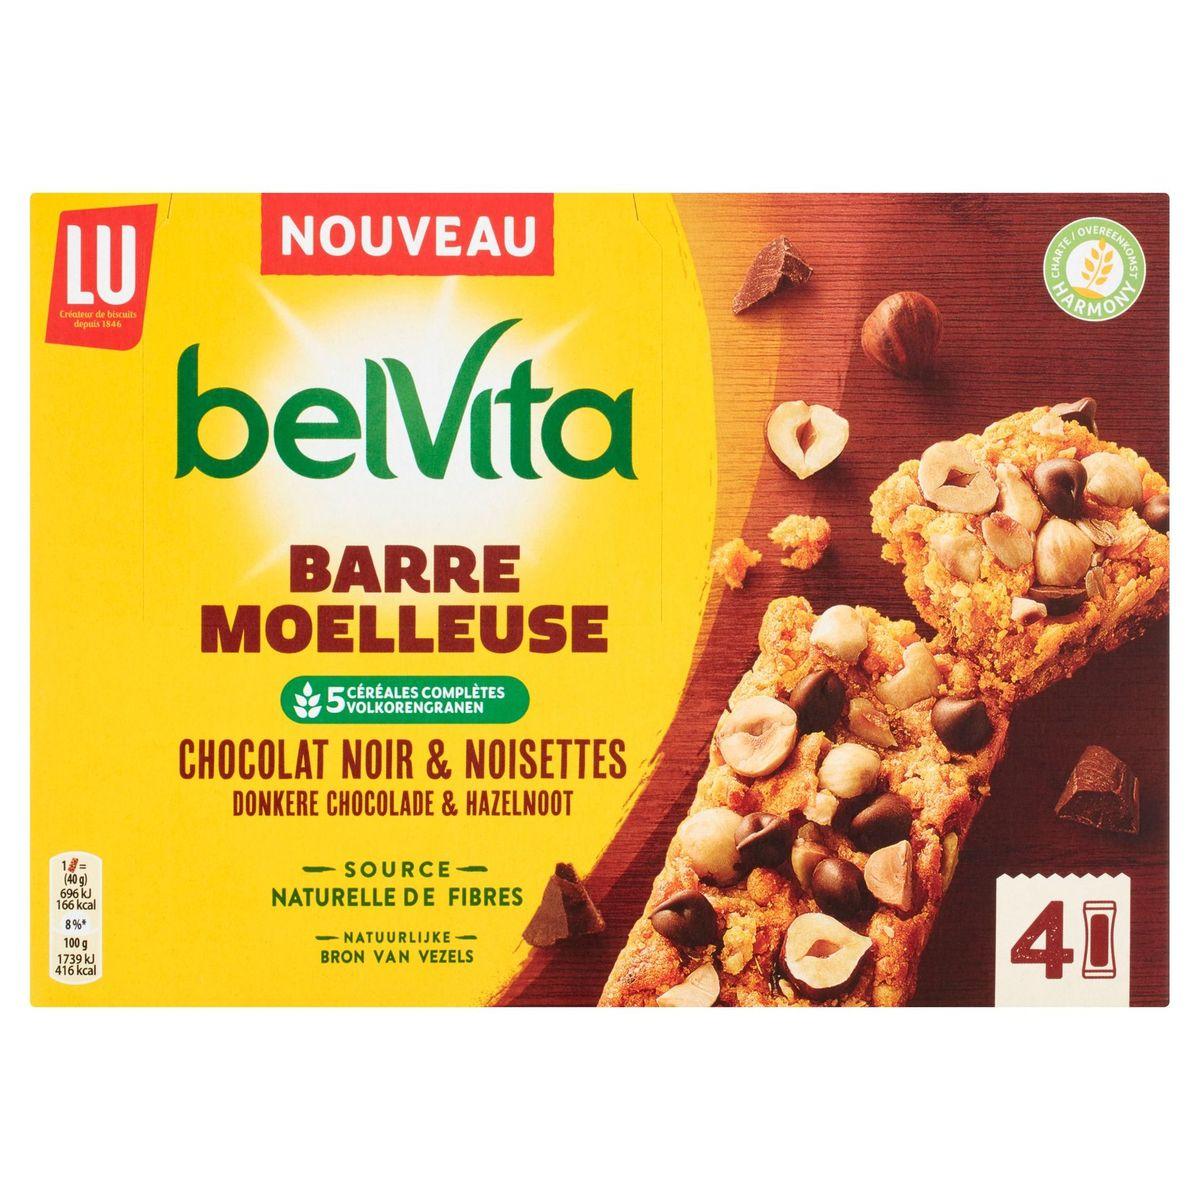 LU BelVita Barre Moelleuse Chocolat Noir & Noisettes 160 g